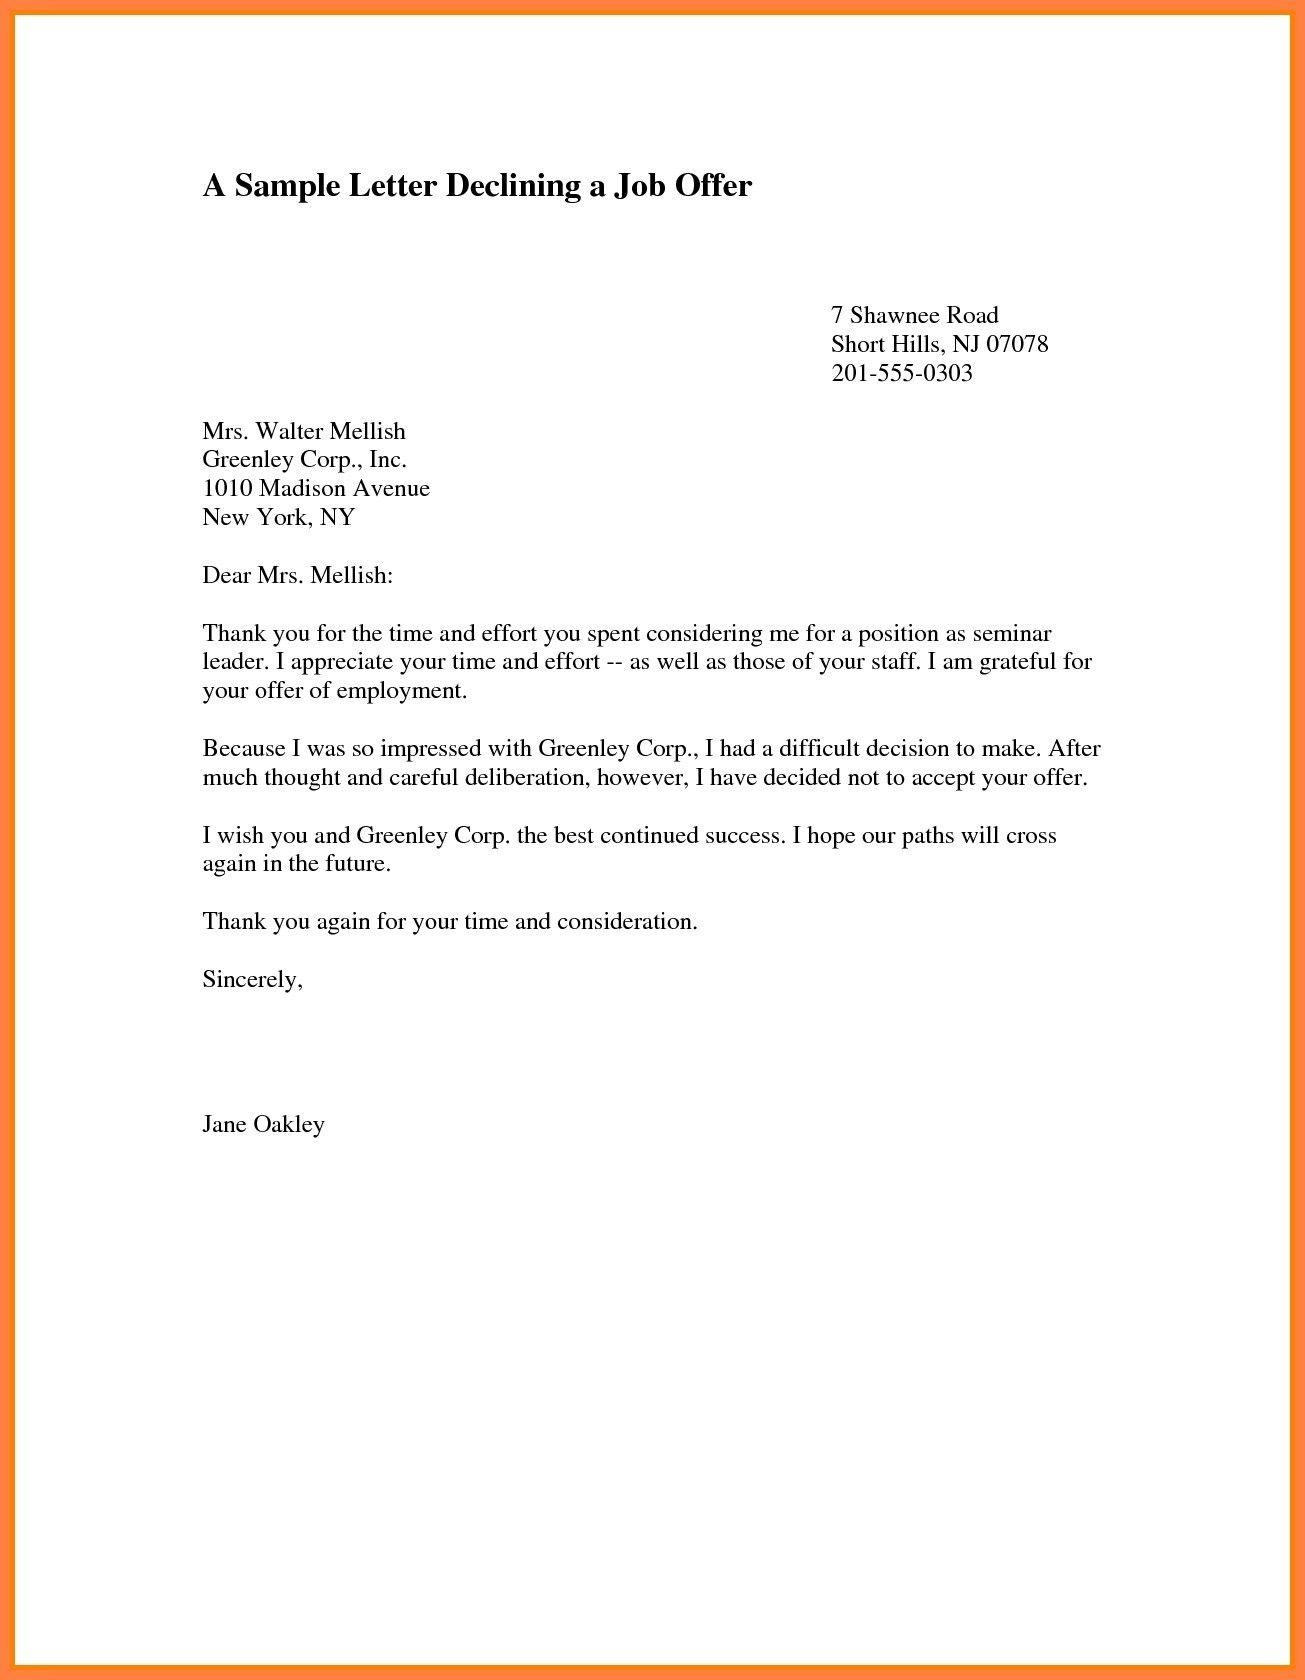 Download fresh declining a job offer letter sample